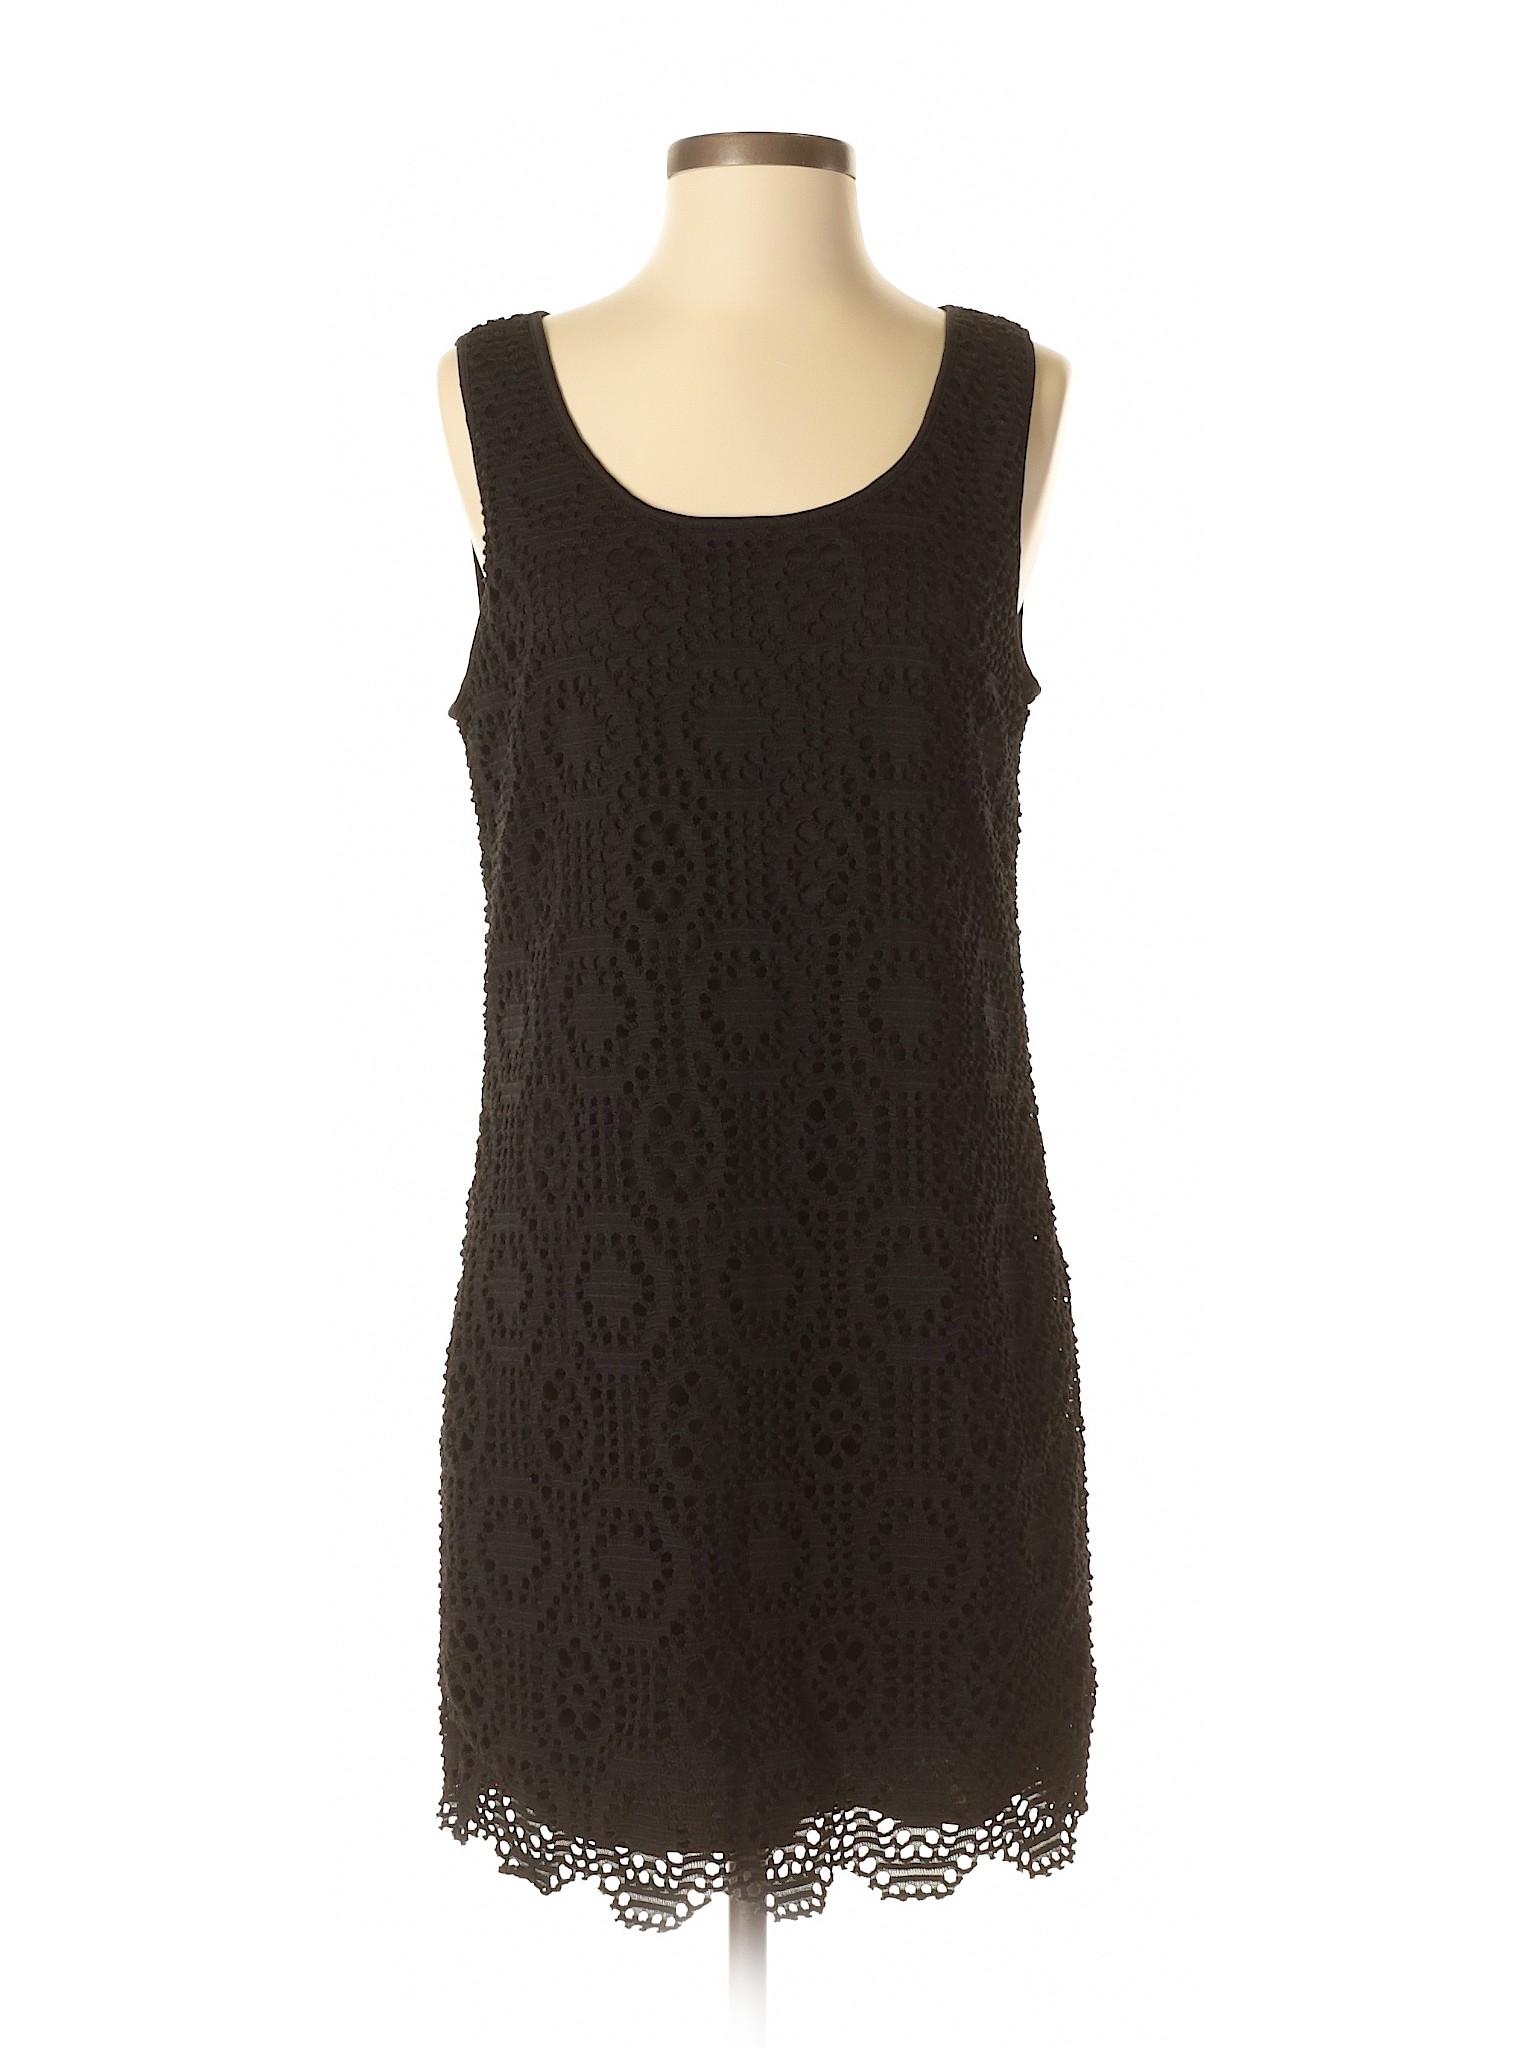 Dress DKNY Dress DKNY Selling Selling Casual DKNY Selling Casual Casual q5AvPdxq